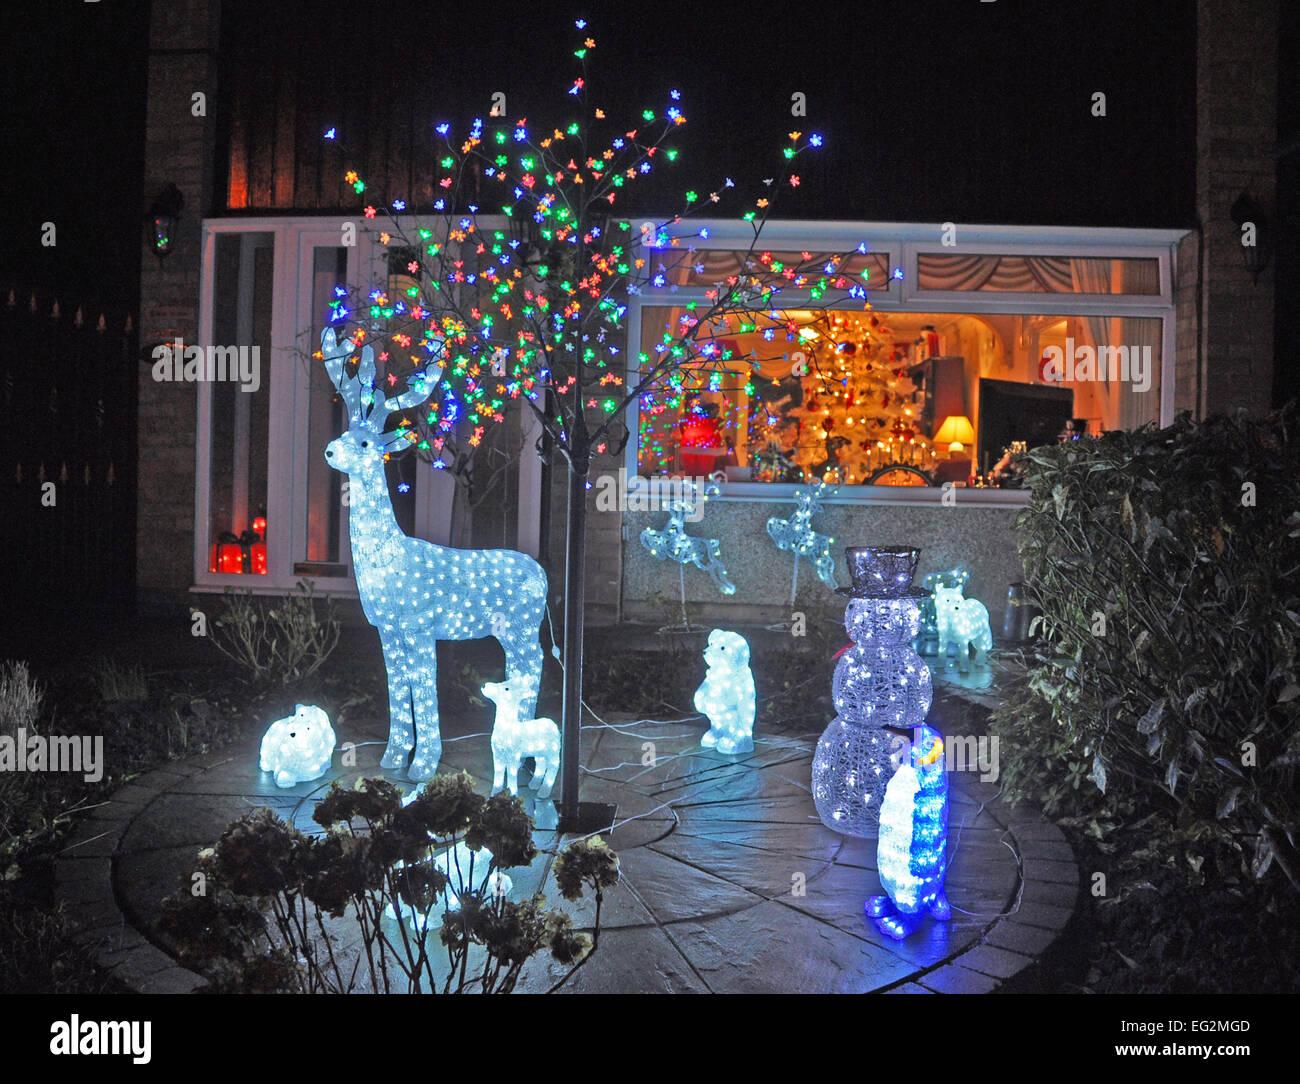 Christmas Decorations Outside Suburban House England